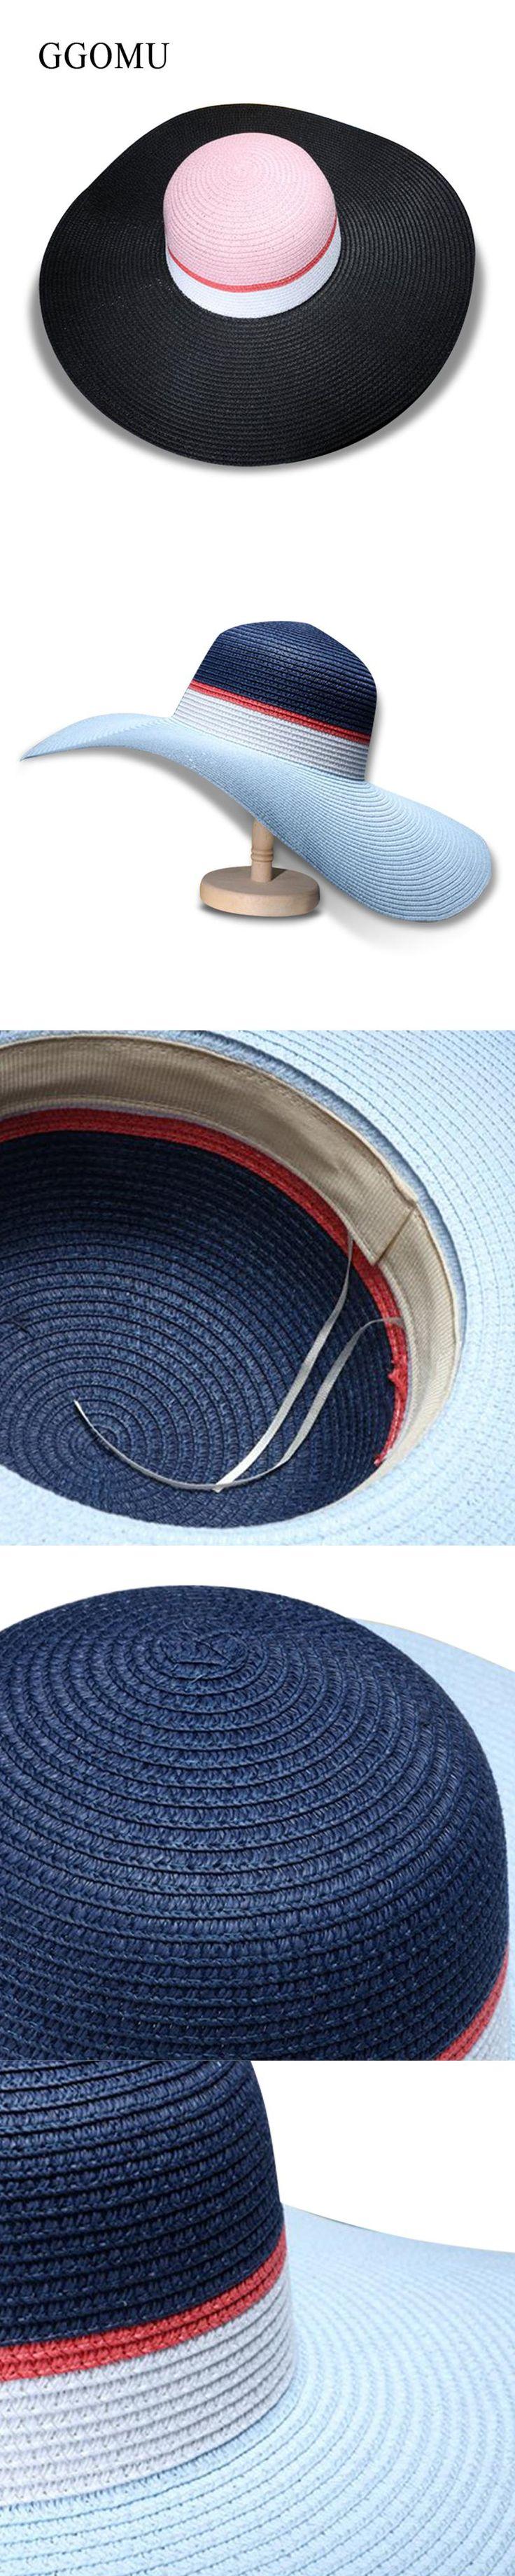 GGOMU New summer colorful sun hats for women Girl sweet big edge straw hat Beach vacation Sunscreen ladies hats ZLH-006